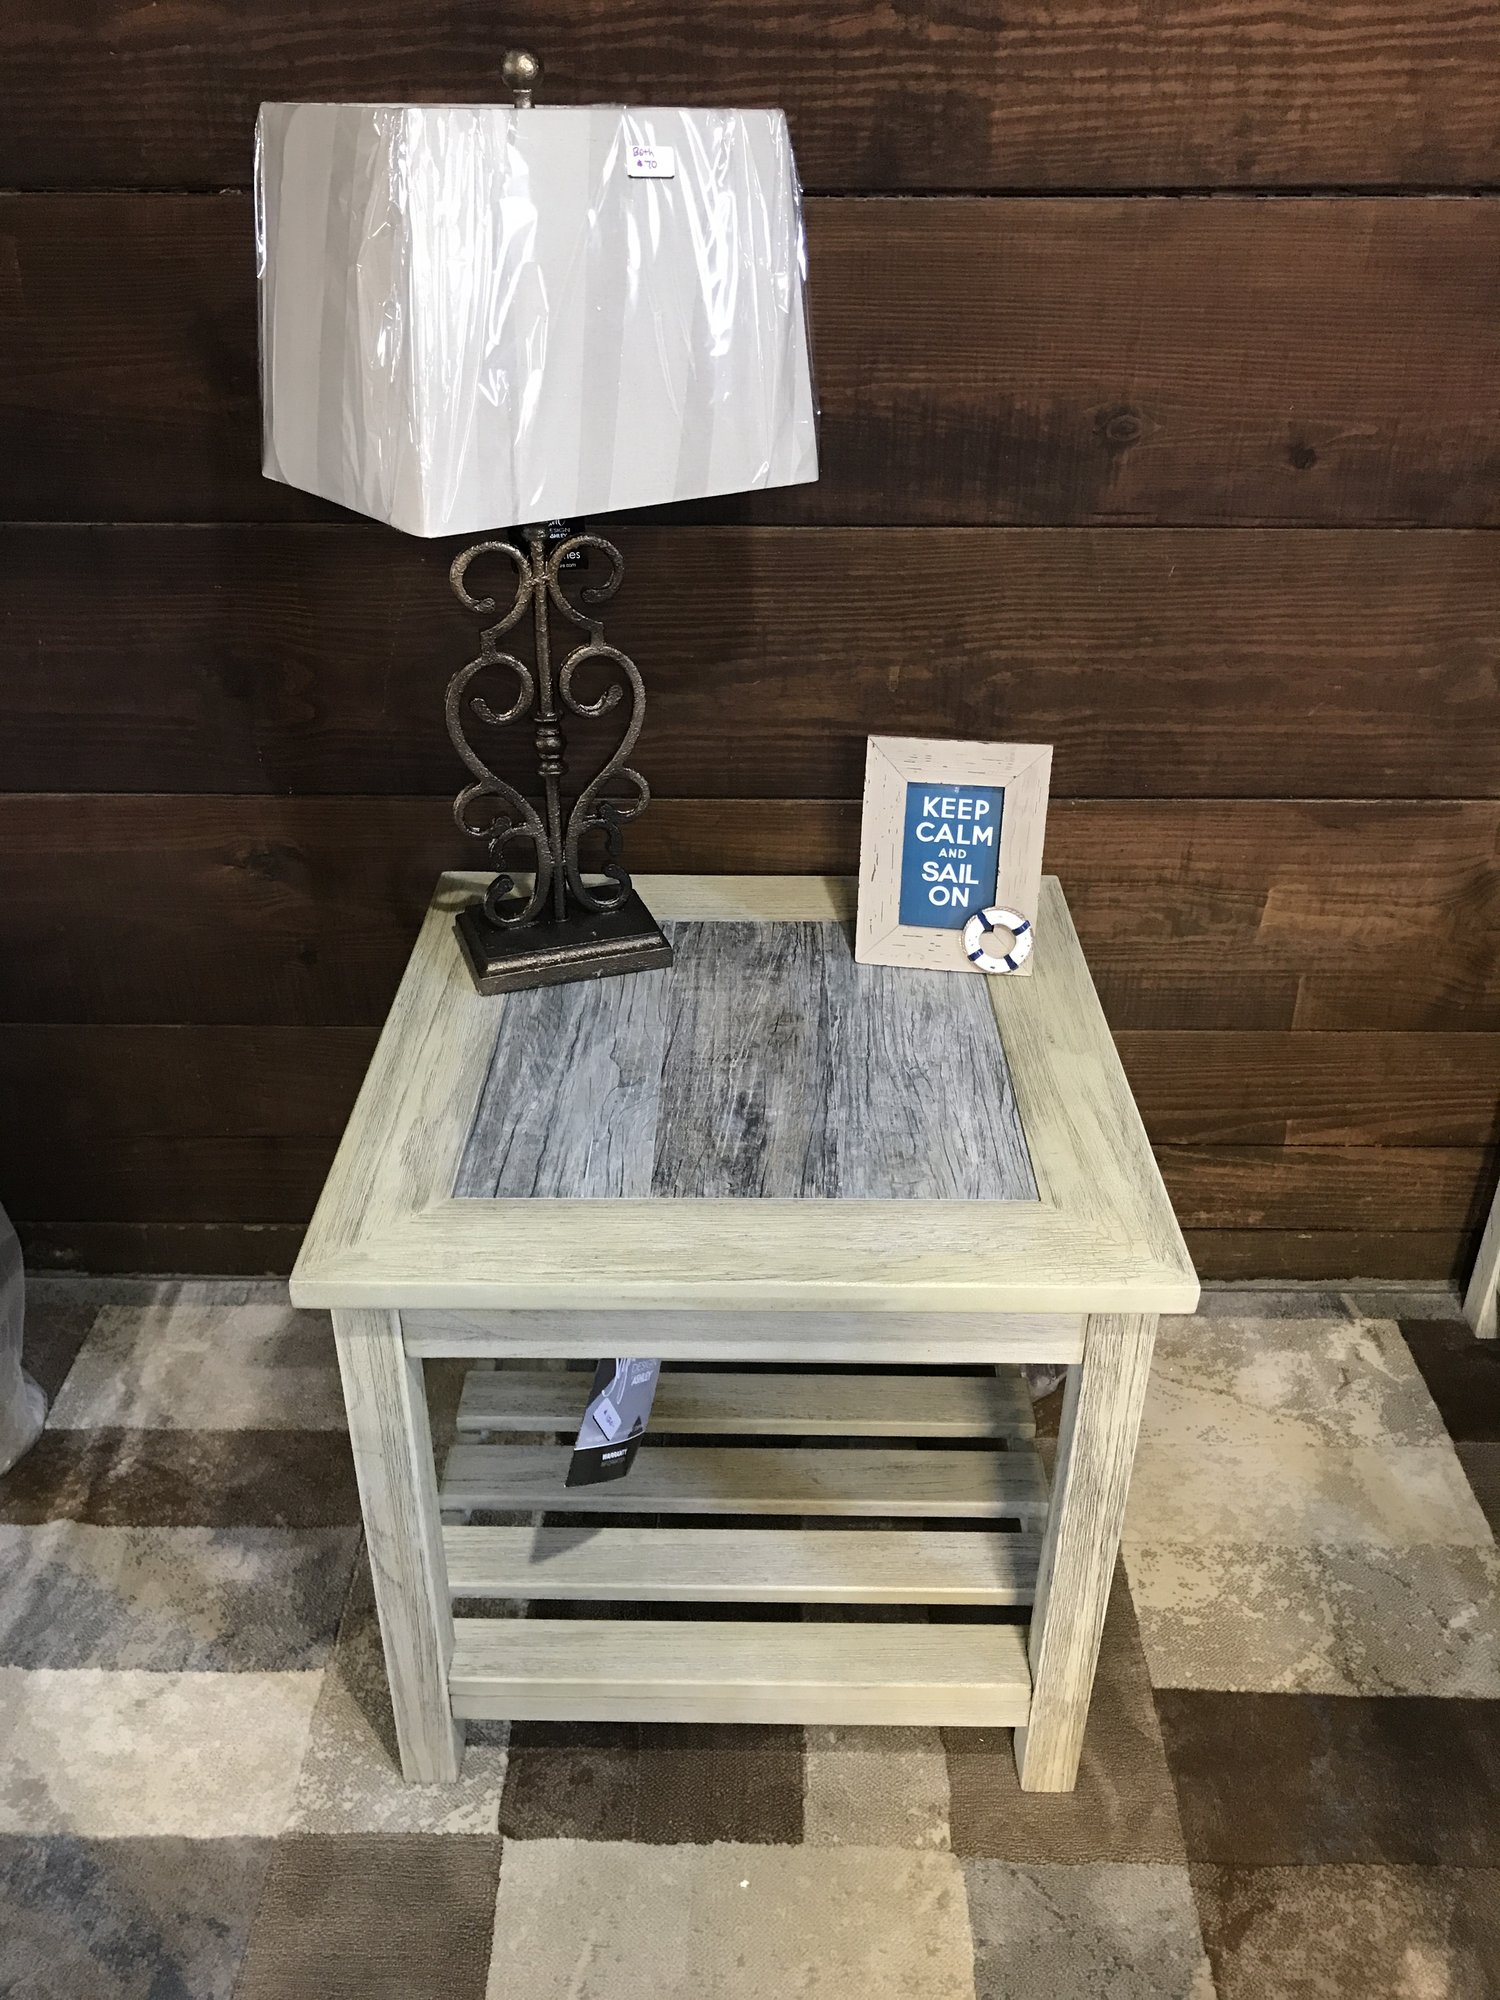 SOLD SIGNATURE DESIGN BY ASHLEY T VELDAR END TABLE WHITEWASH - Ashley veldar coffee table